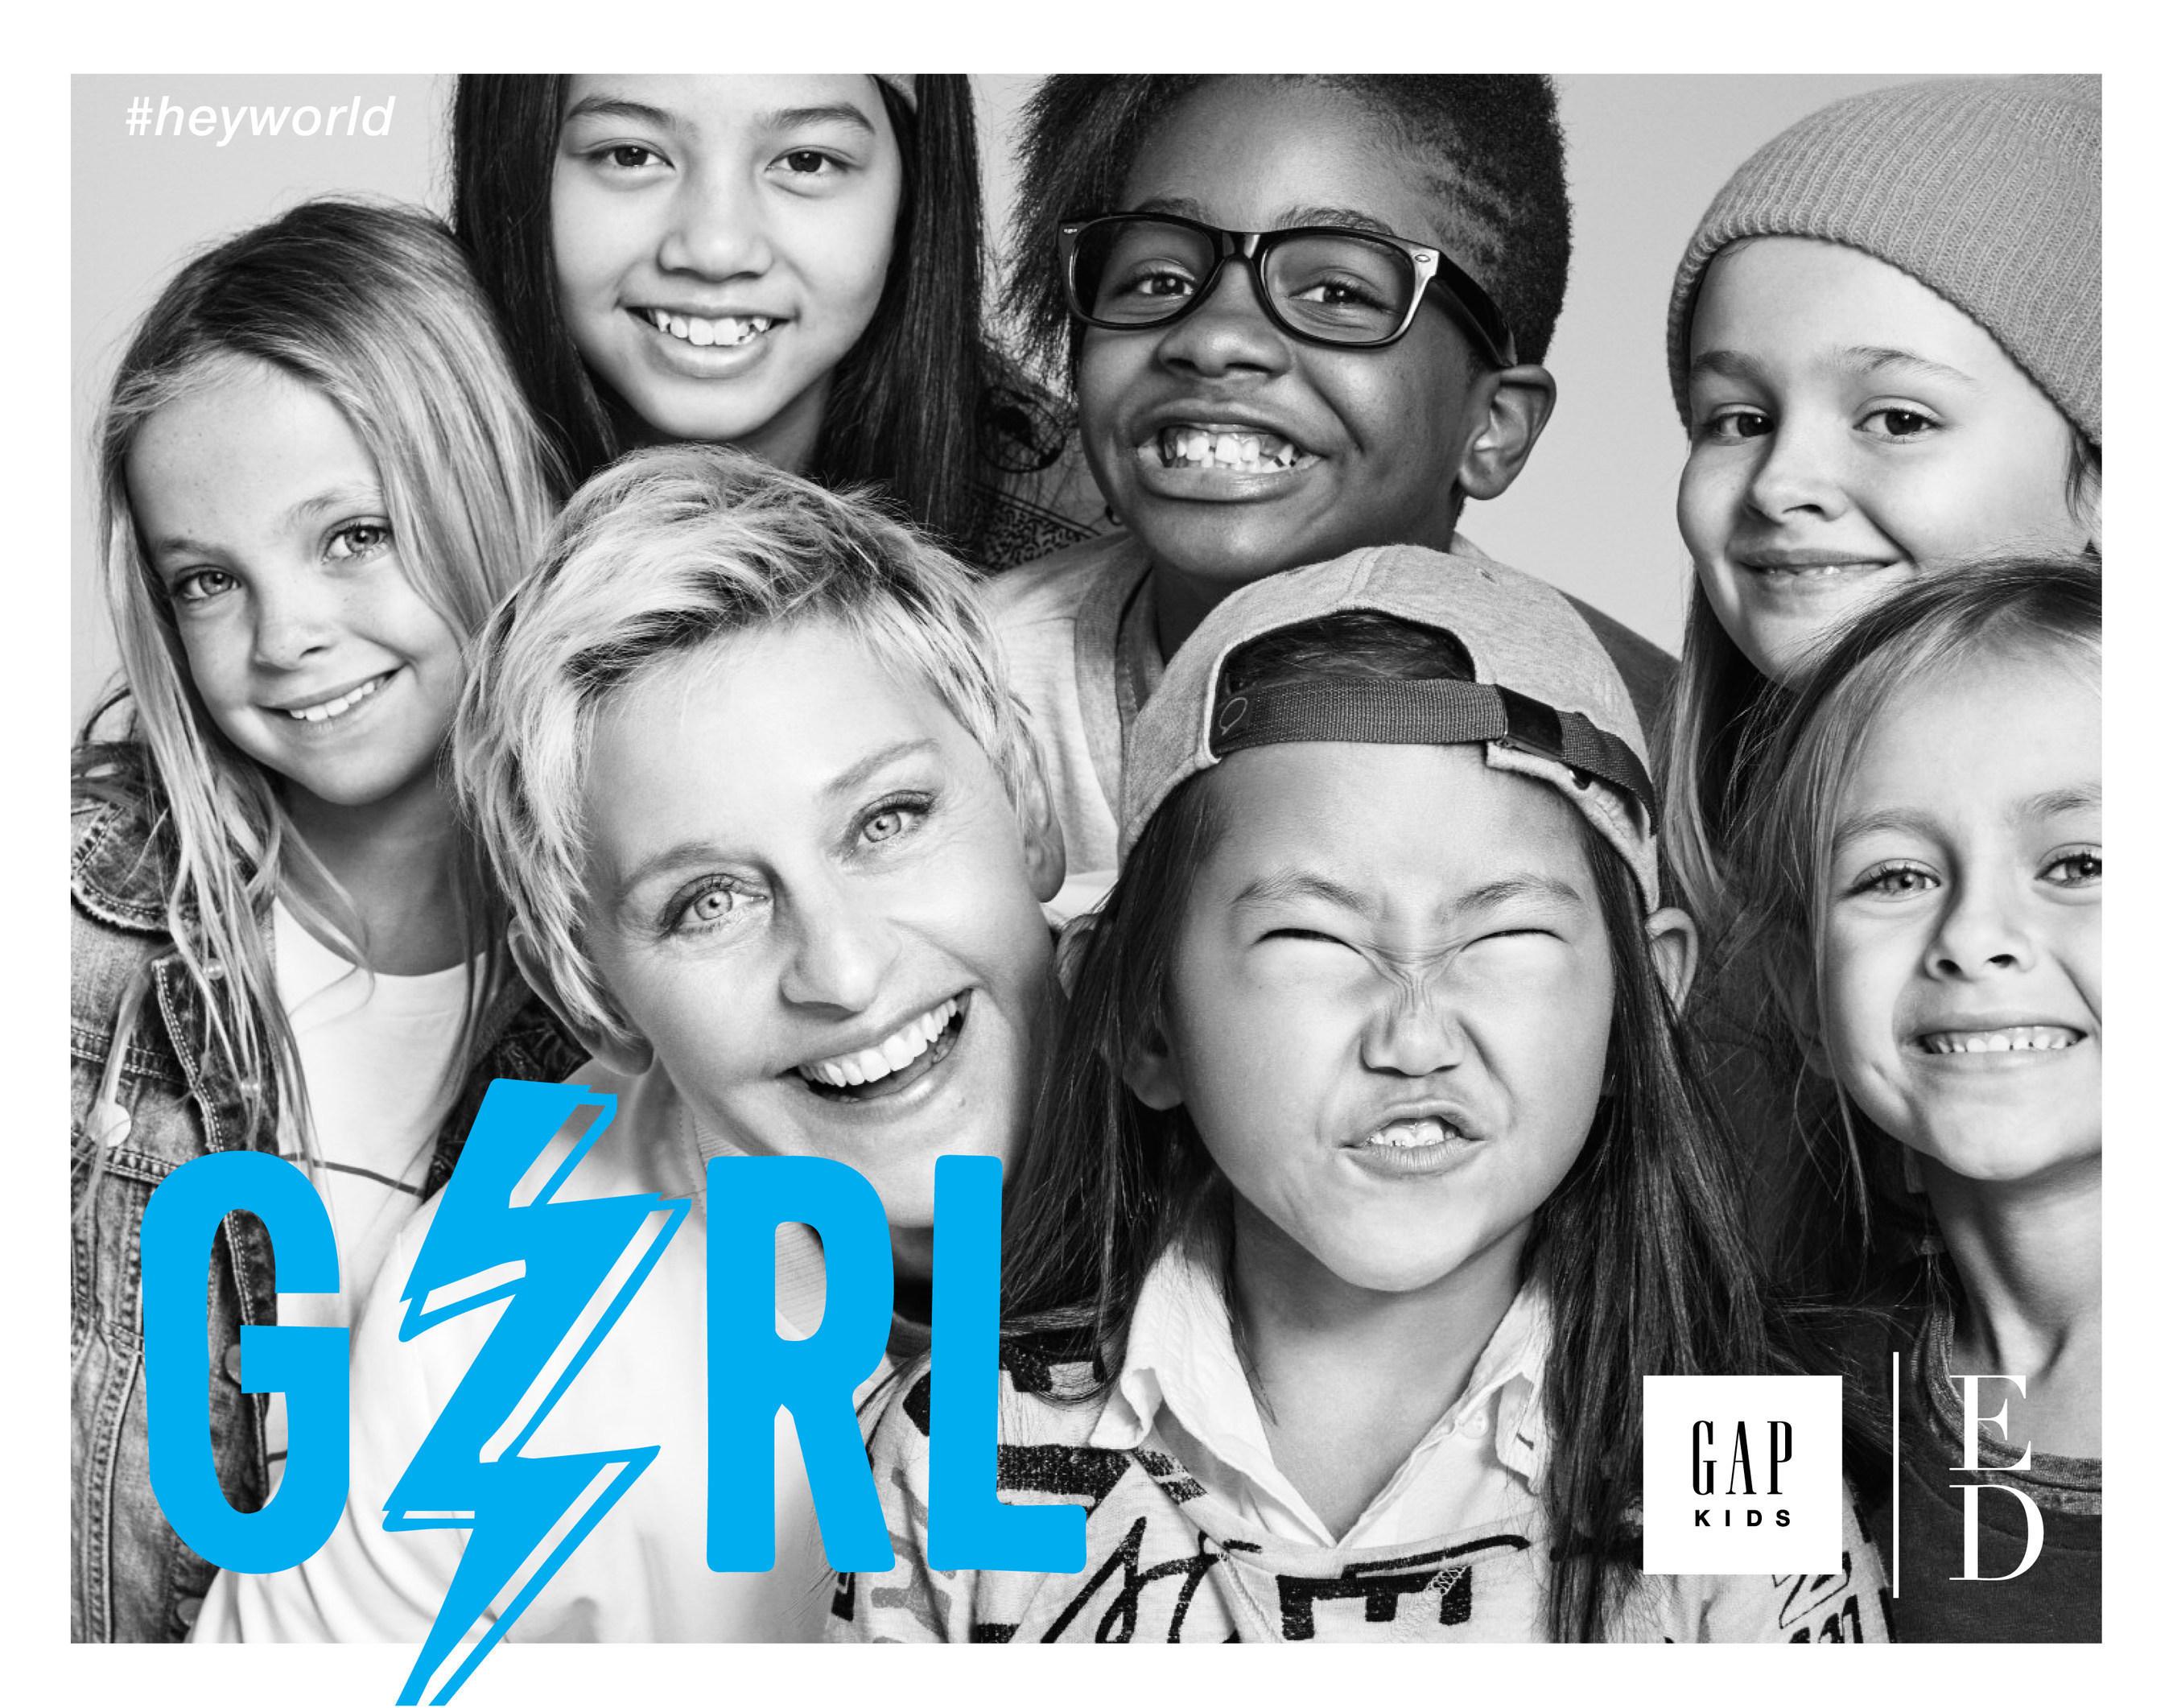 GapKids x ED Campaign Image